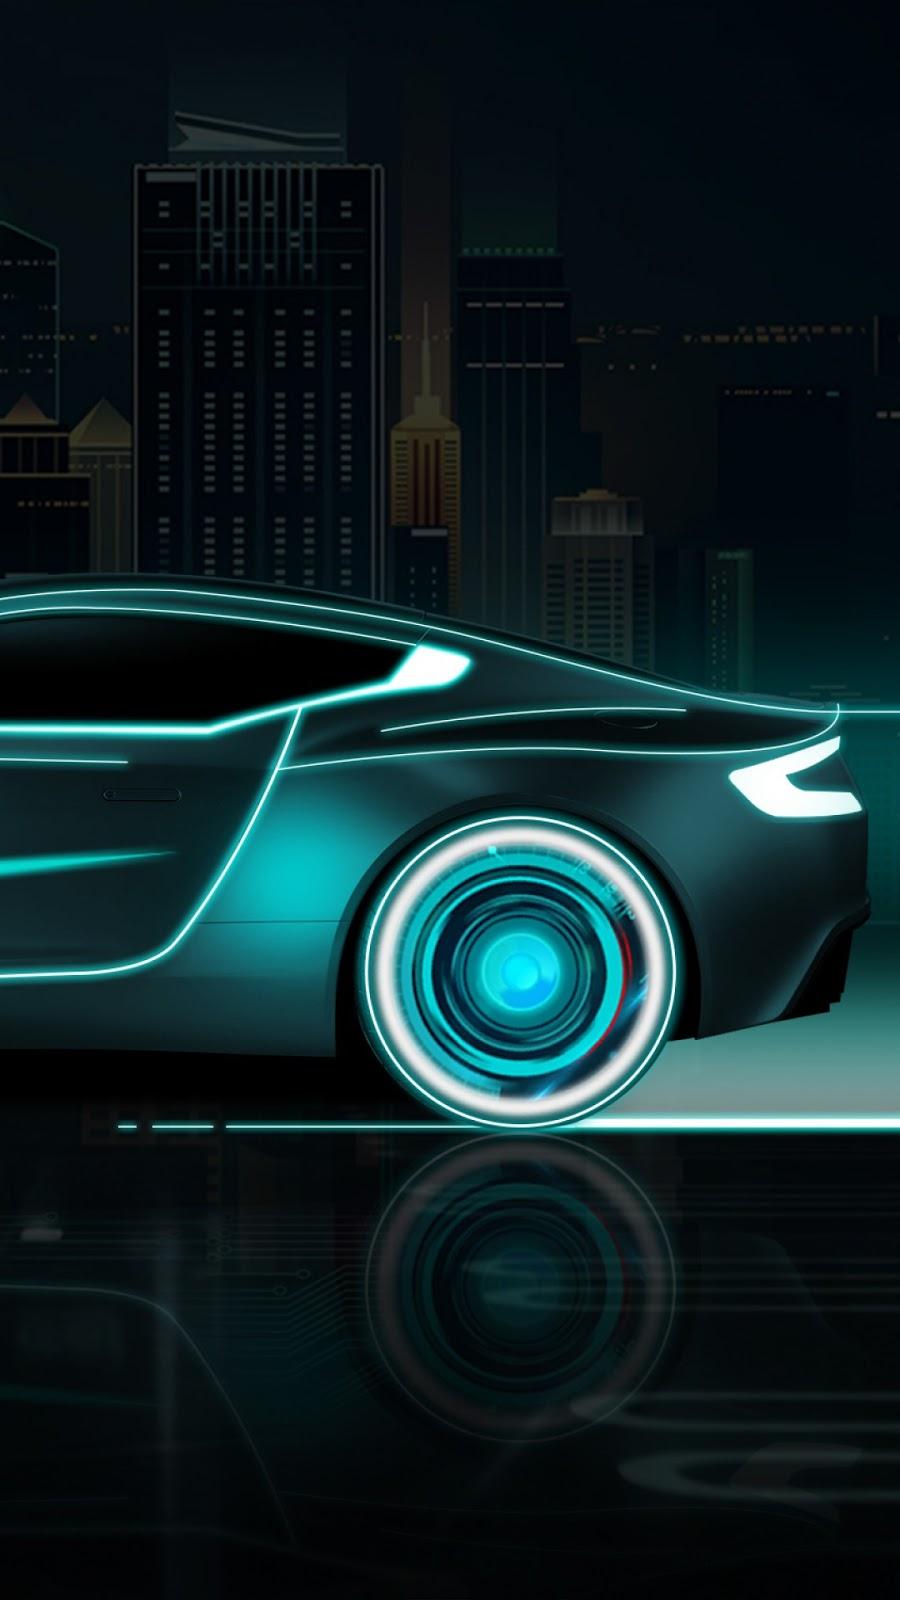 Papel de parede grátis Carro Neon Arte Digital para PC, Notebook, iPhone, Android e Tablet.